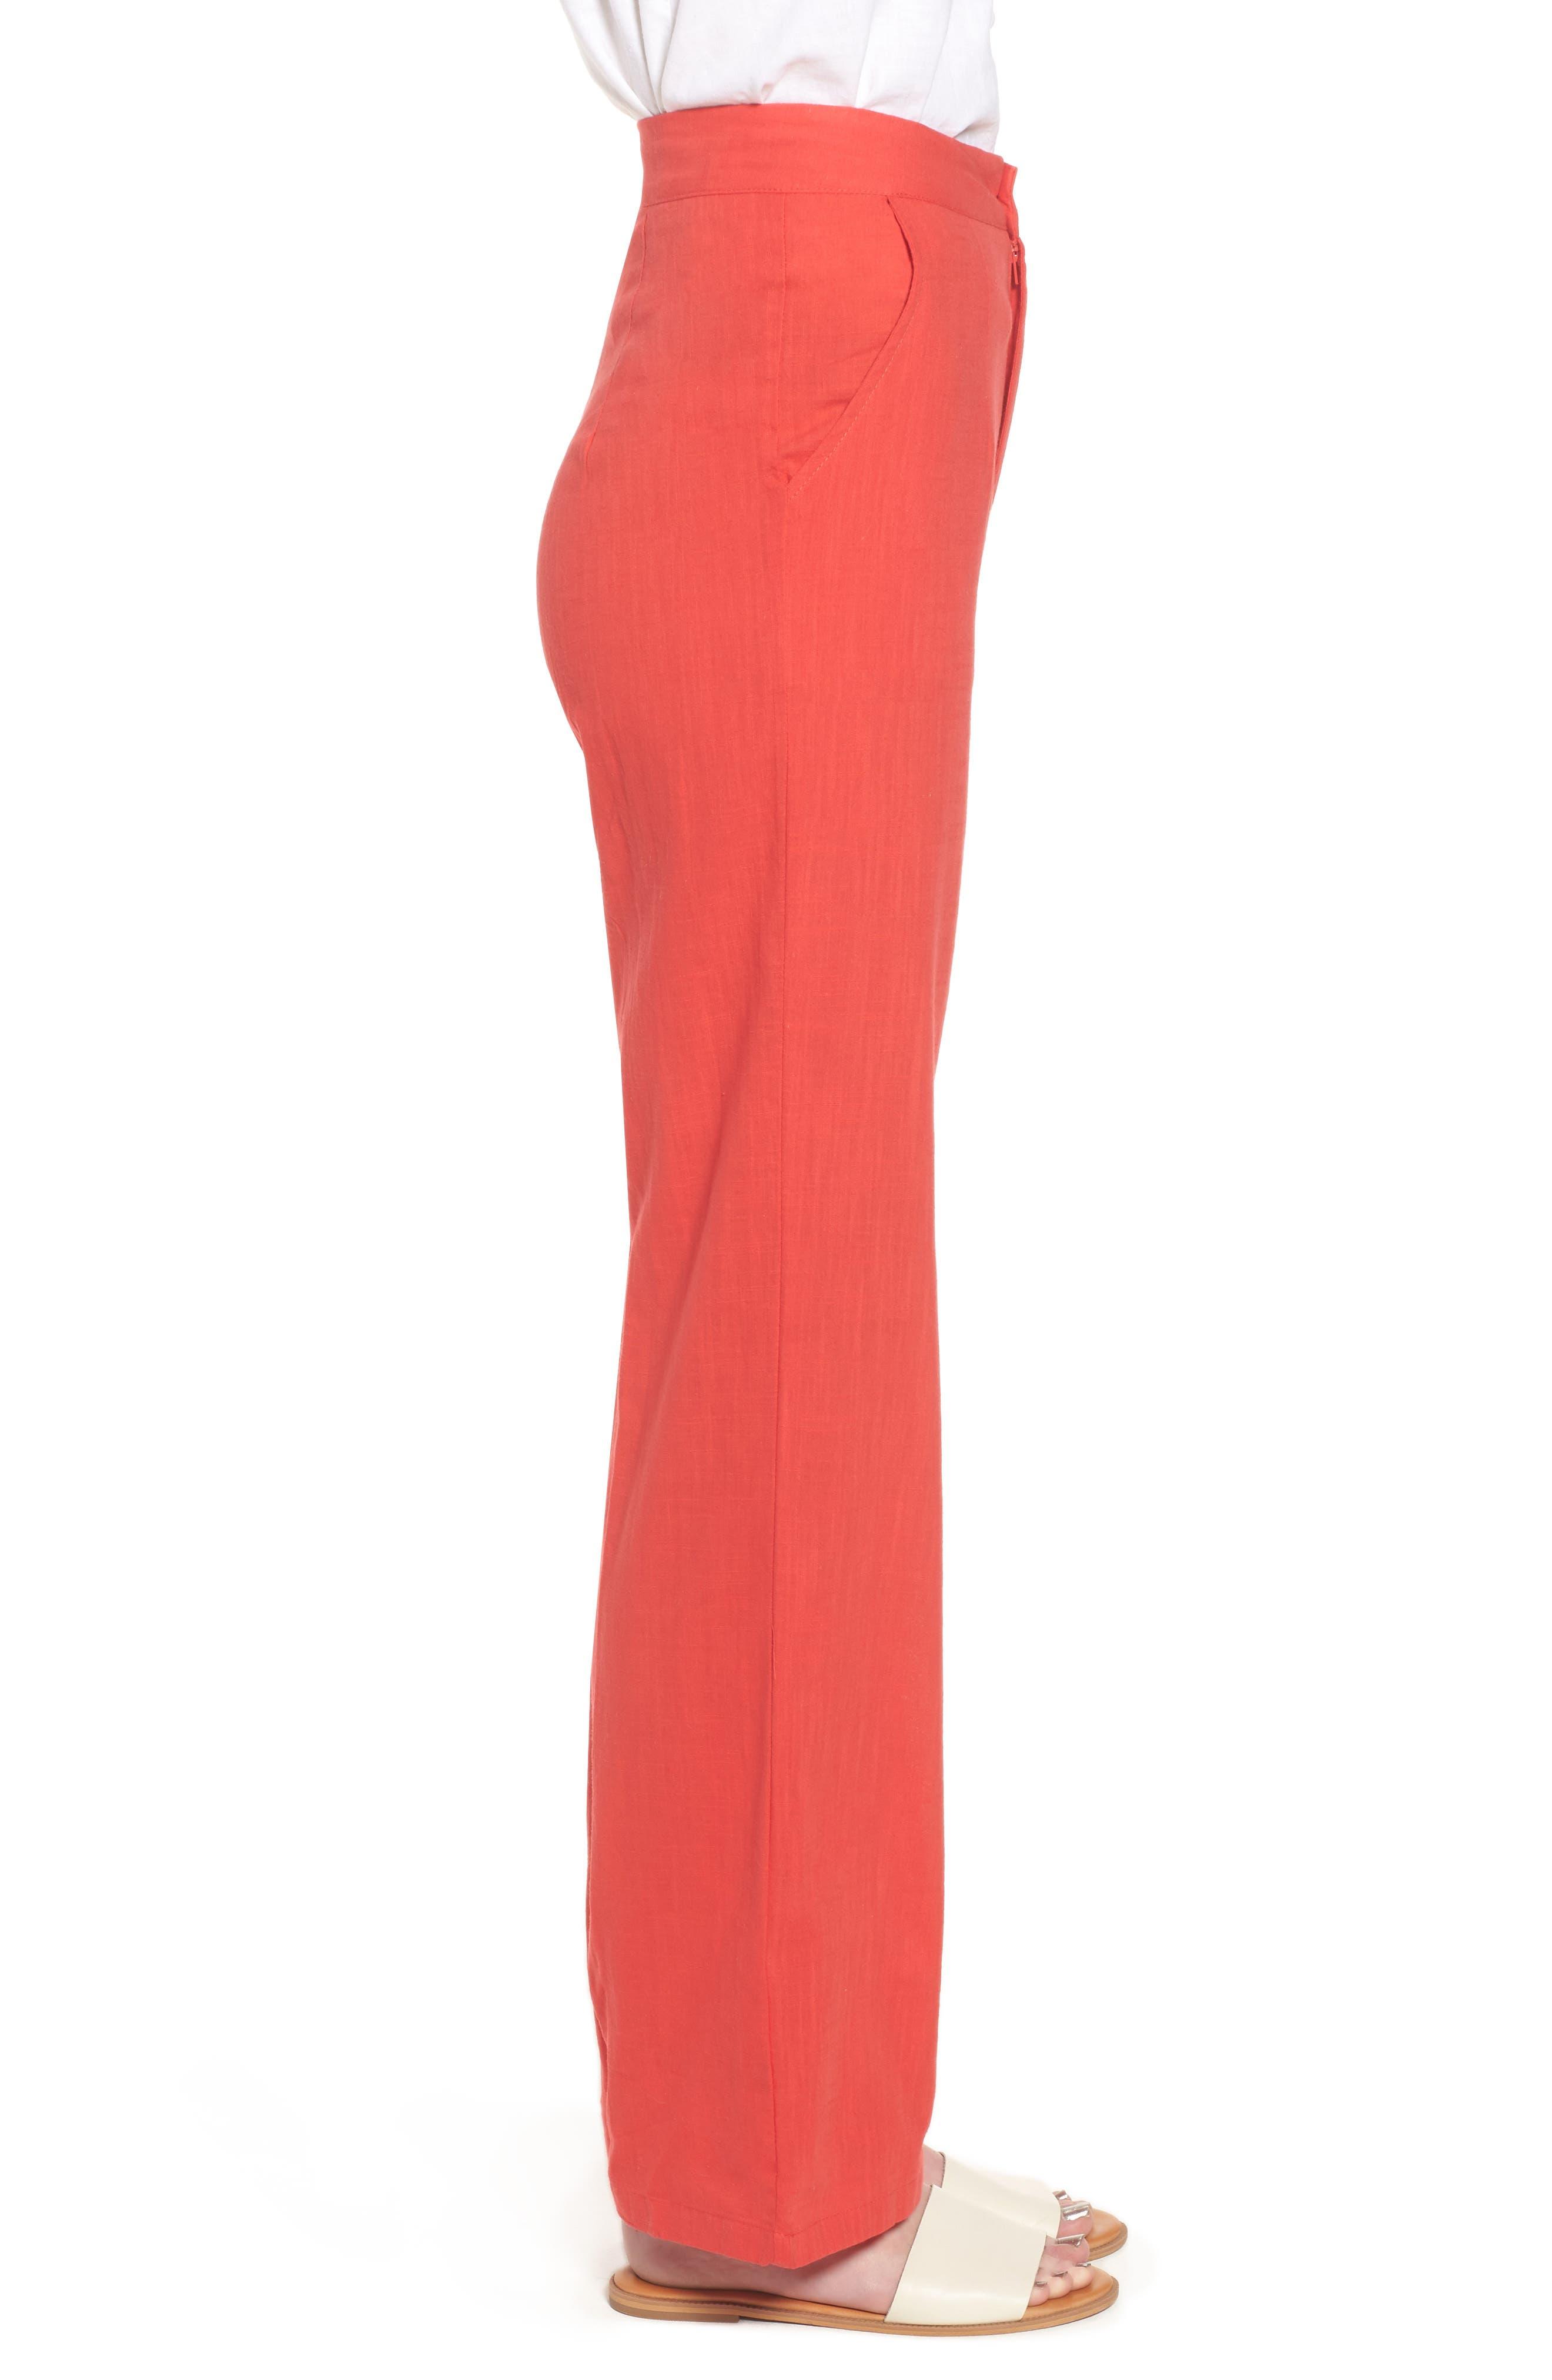 Femme Fatale High Waist Pants,                             Alternate thumbnail 3, color,                             Red